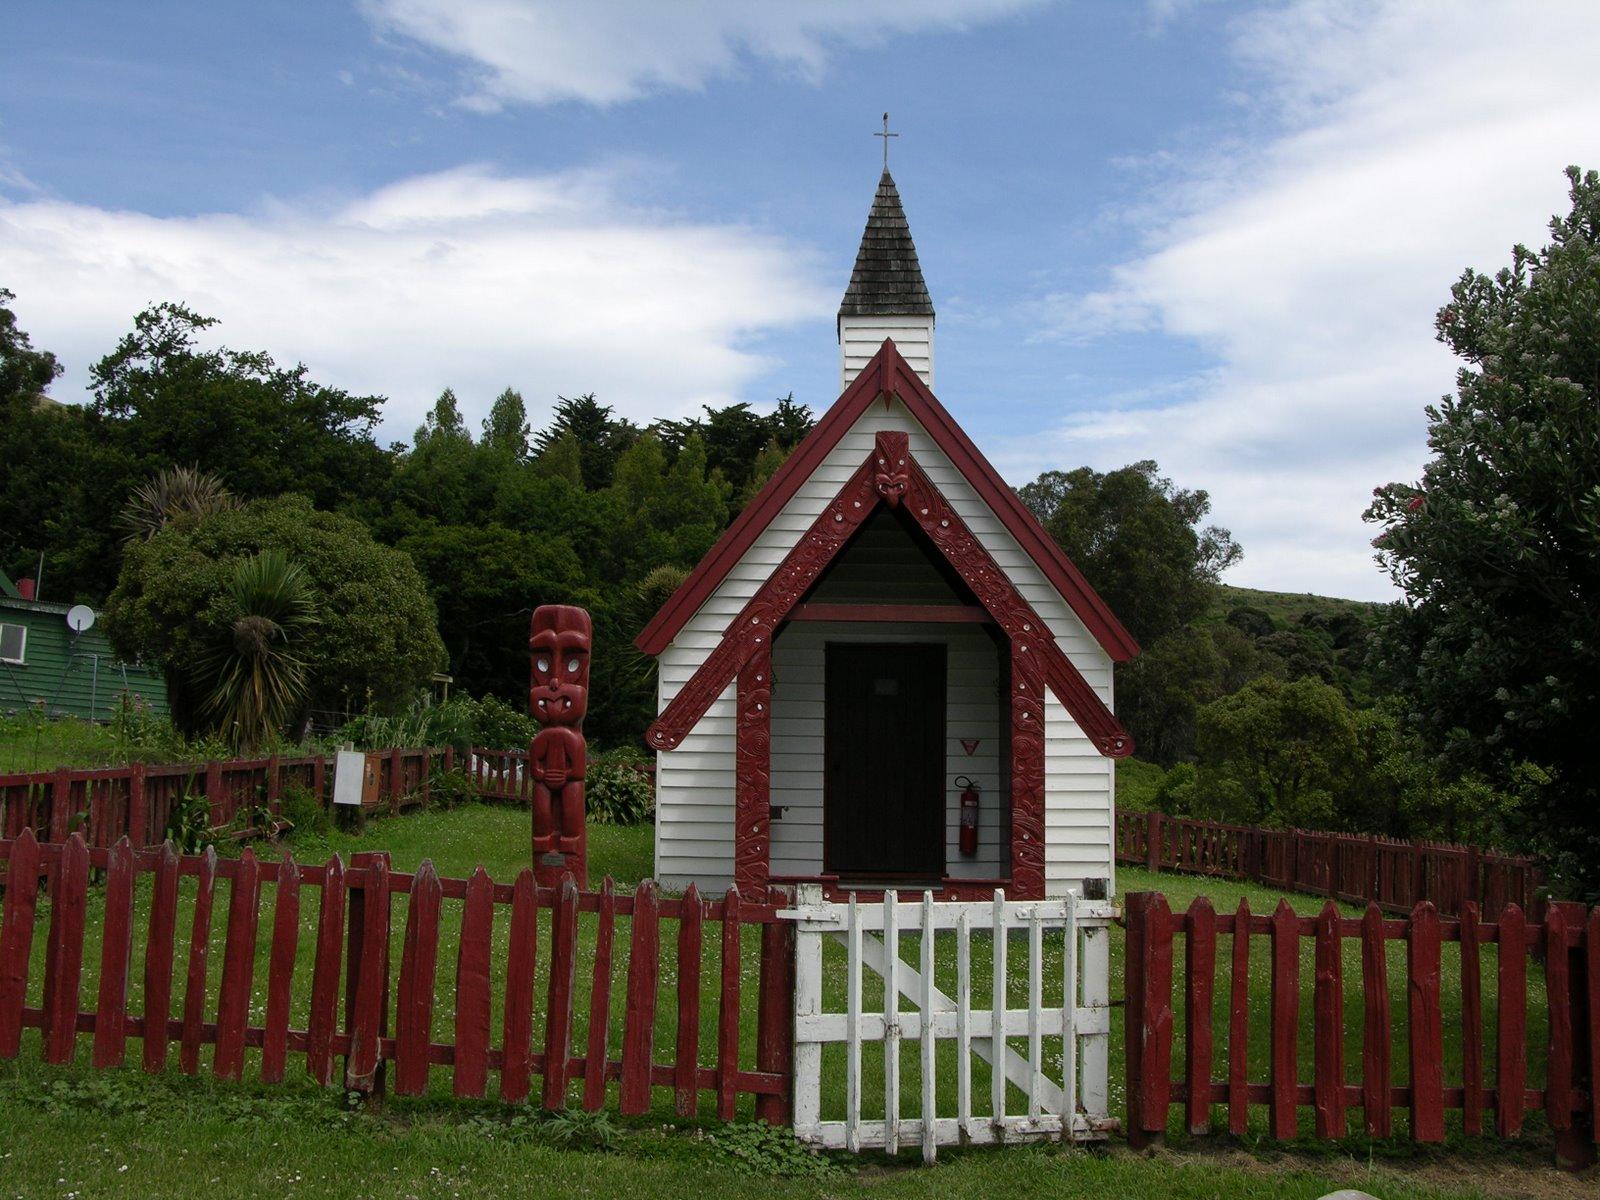 A Symposium Aspects Of Māori Christianity And Mission Jason Goroncy - Maori religion